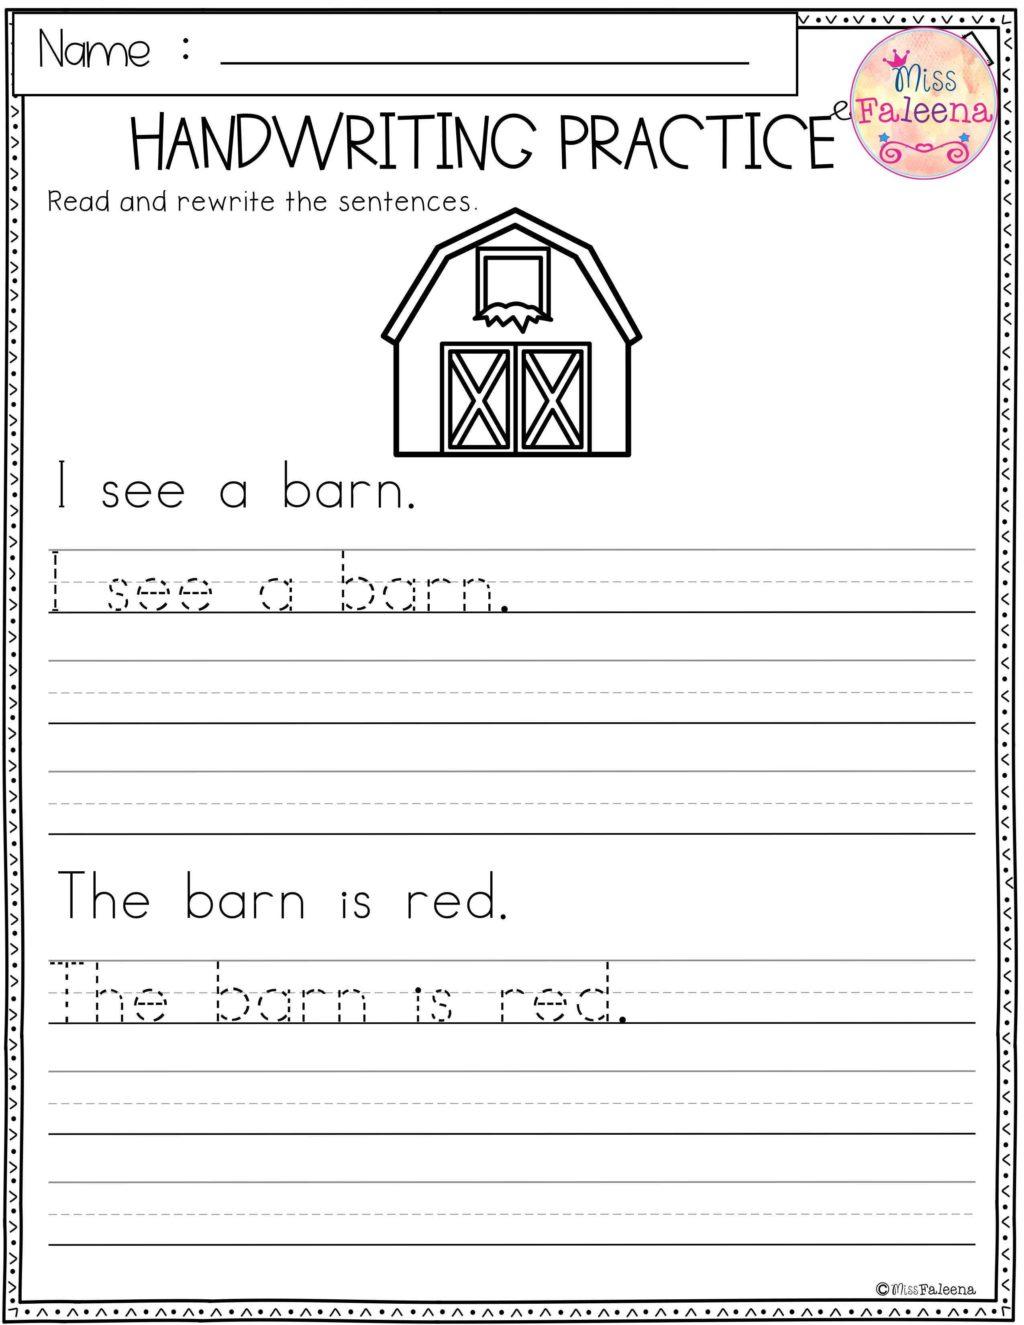 Worksheet ~ Free Handwritingtst Generator For Kids Free